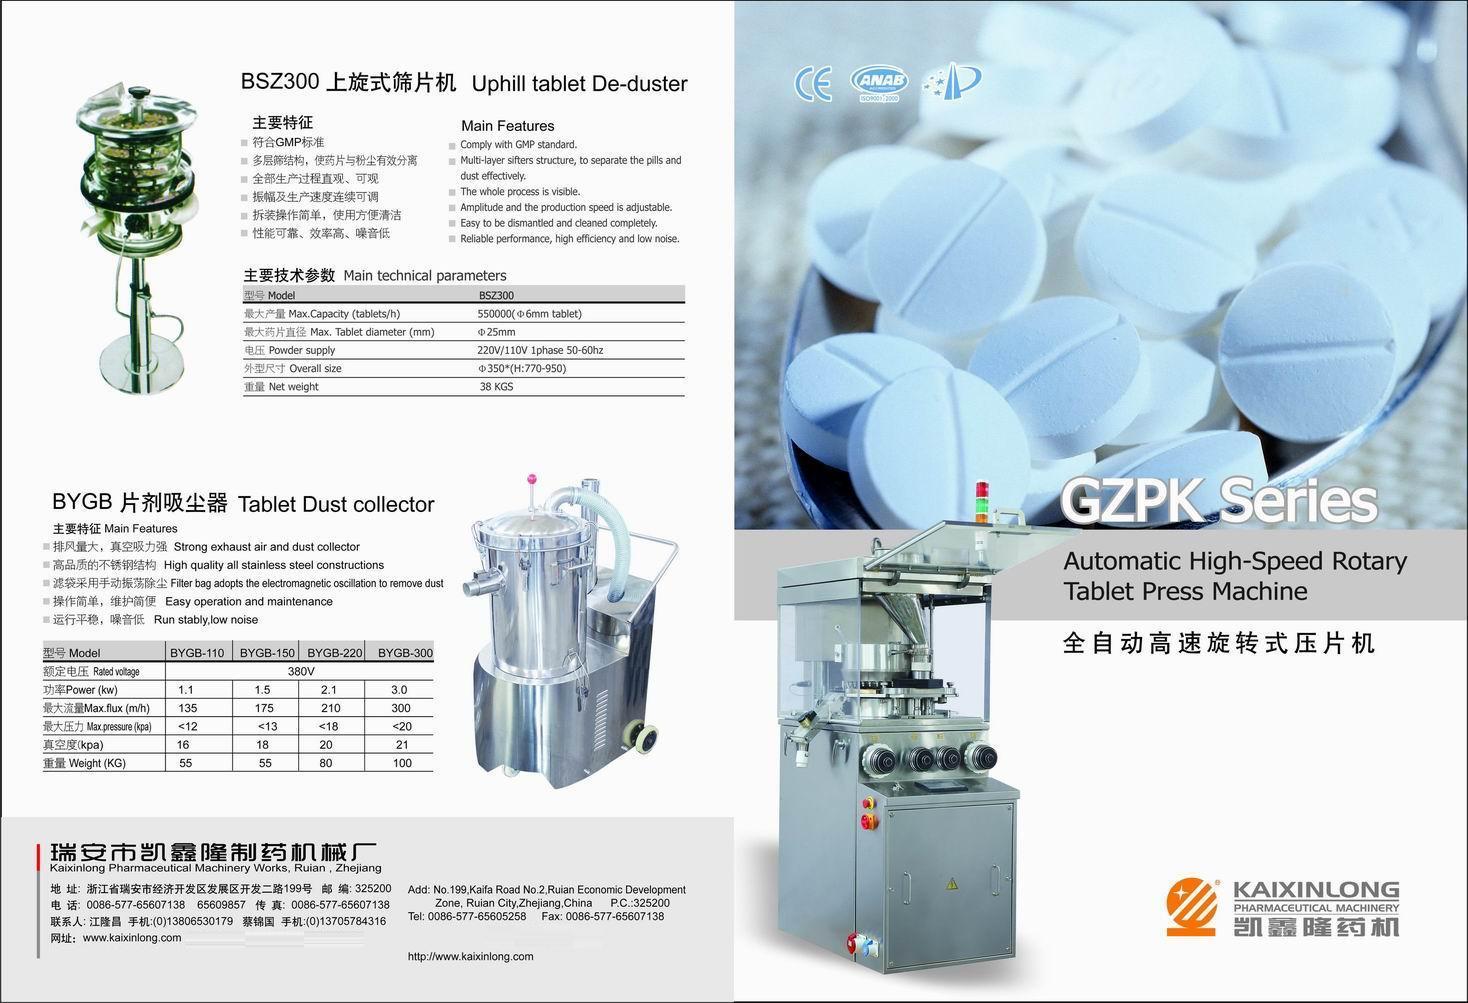 Tablet Press Machine (GZPK)